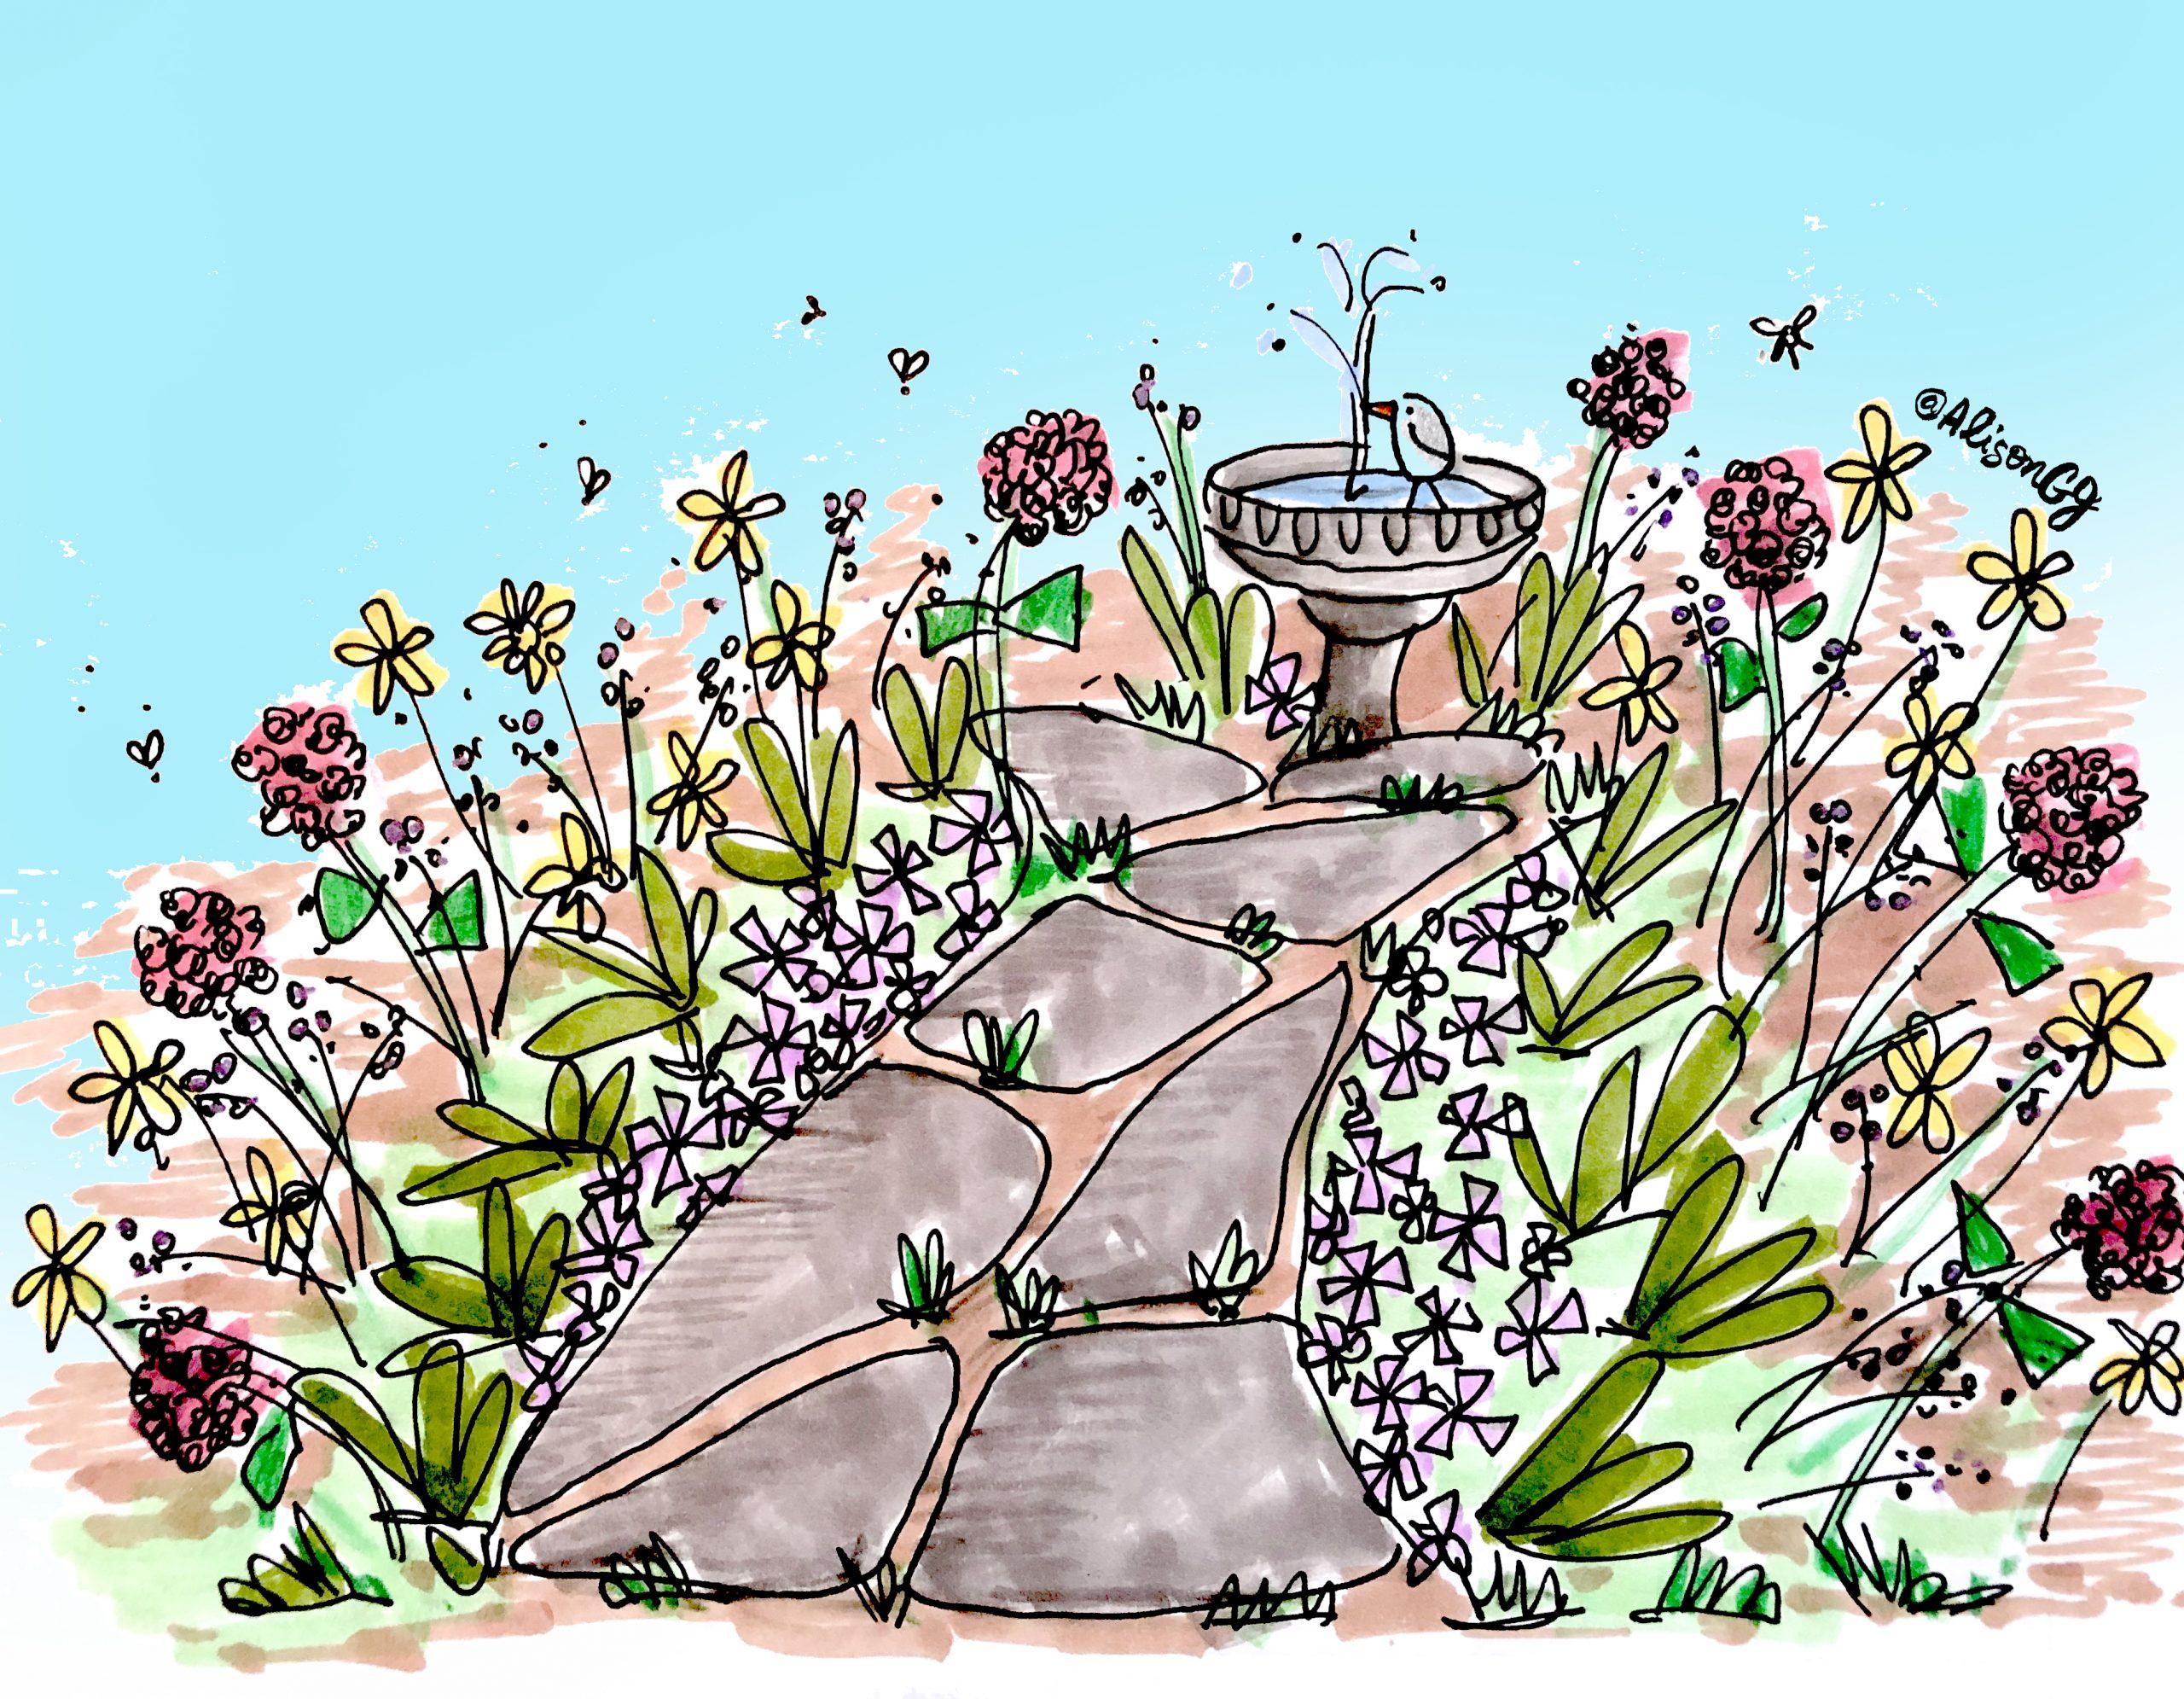 Nature Sketch By Alison Garwood-Jones